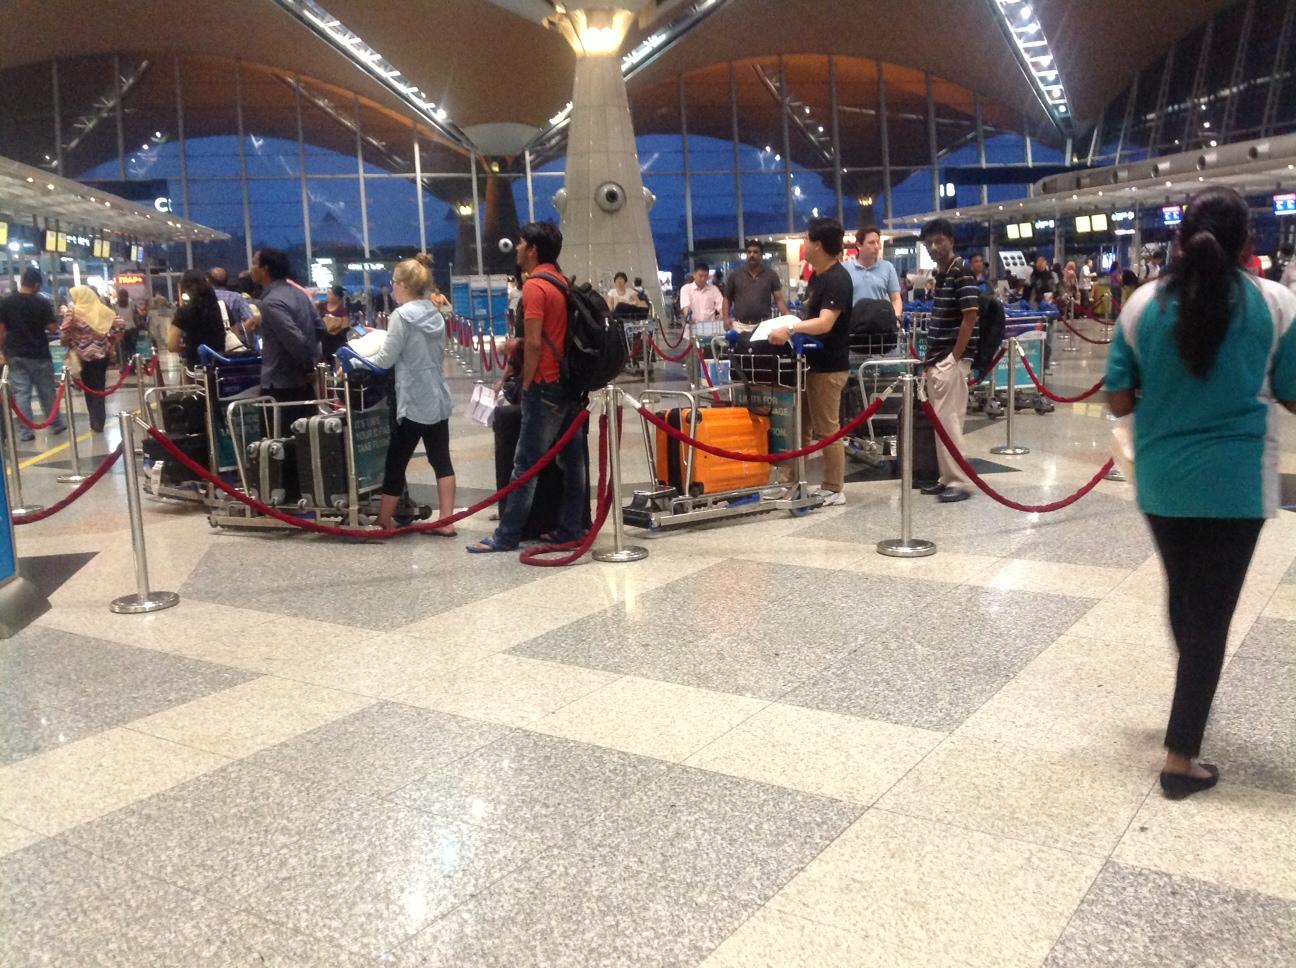 Passengers checking-in at Kuala Lumpur International Airport. Credit: MST